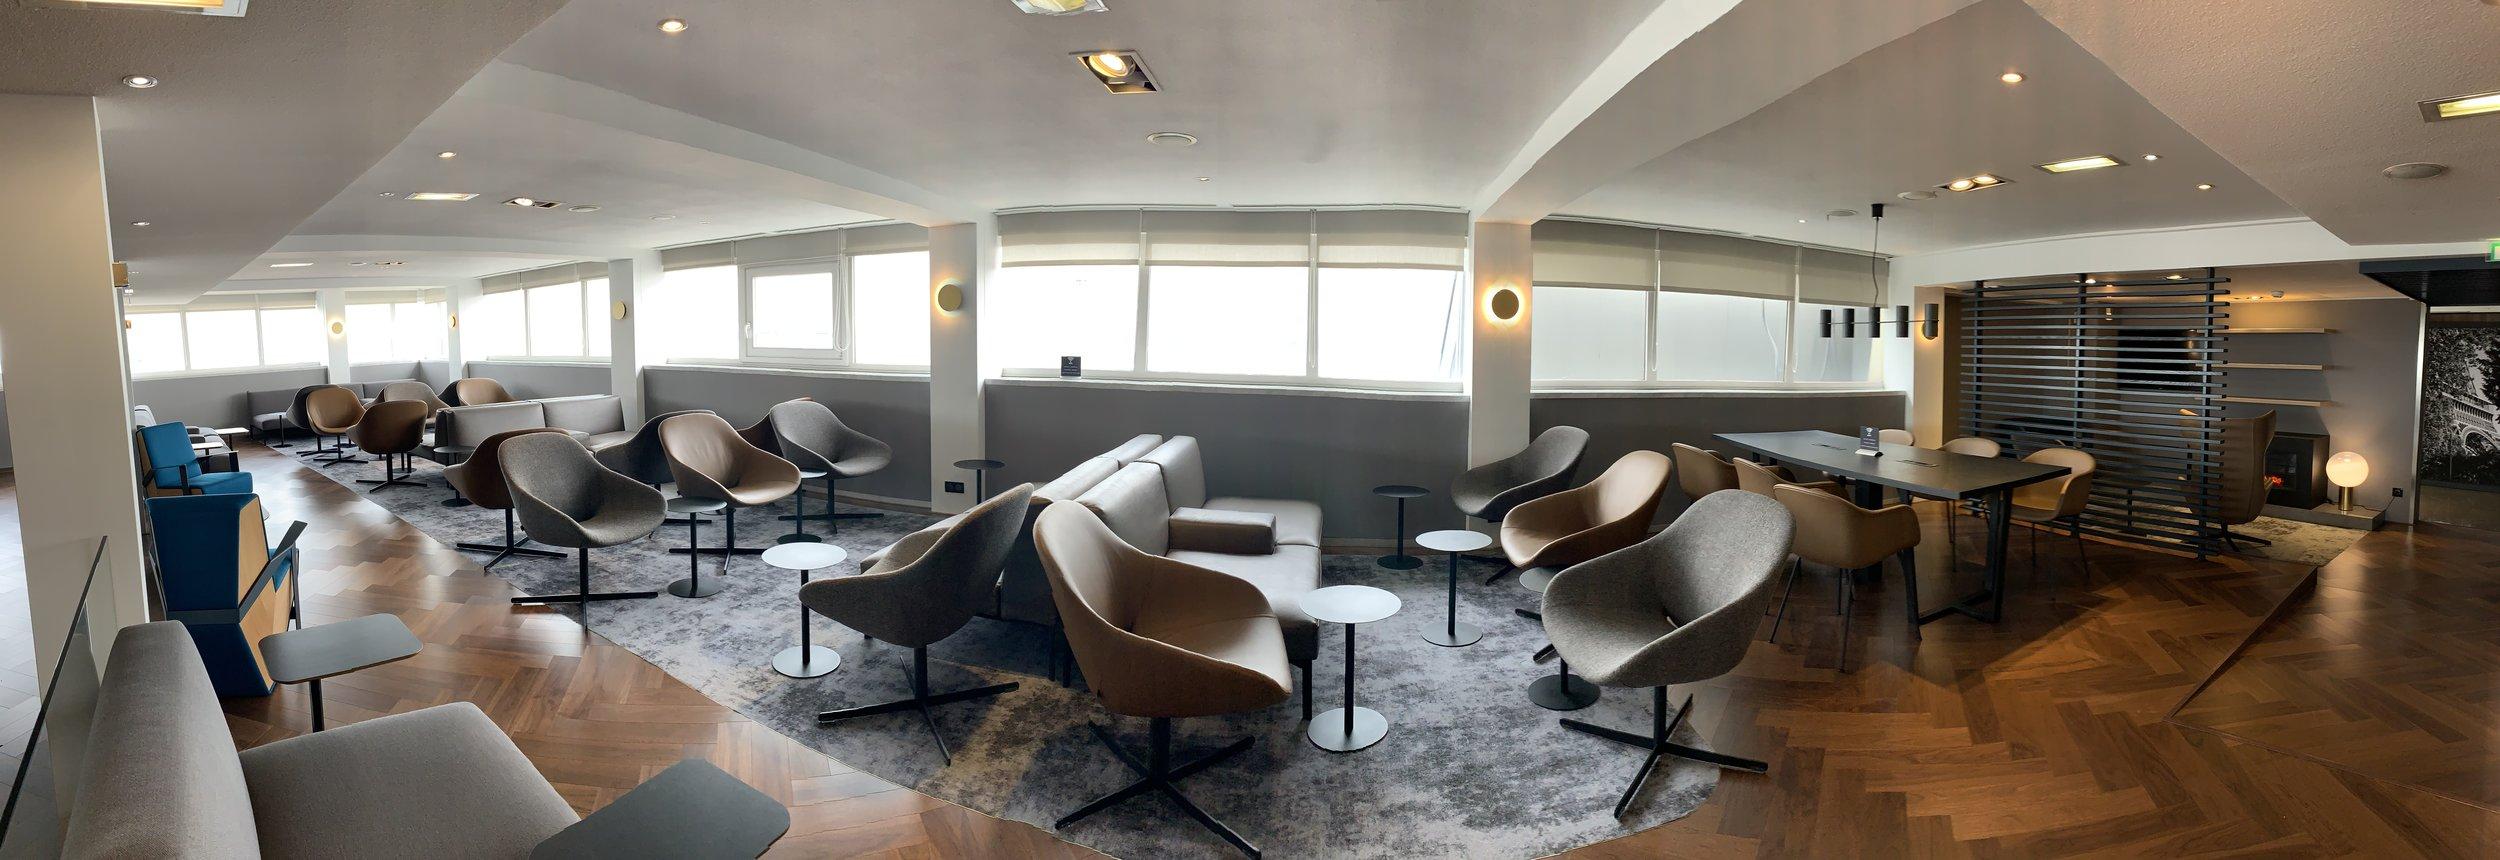 New Refurbished Star Alliance Lounge Paris Charles De Gaulle 10.jpeg